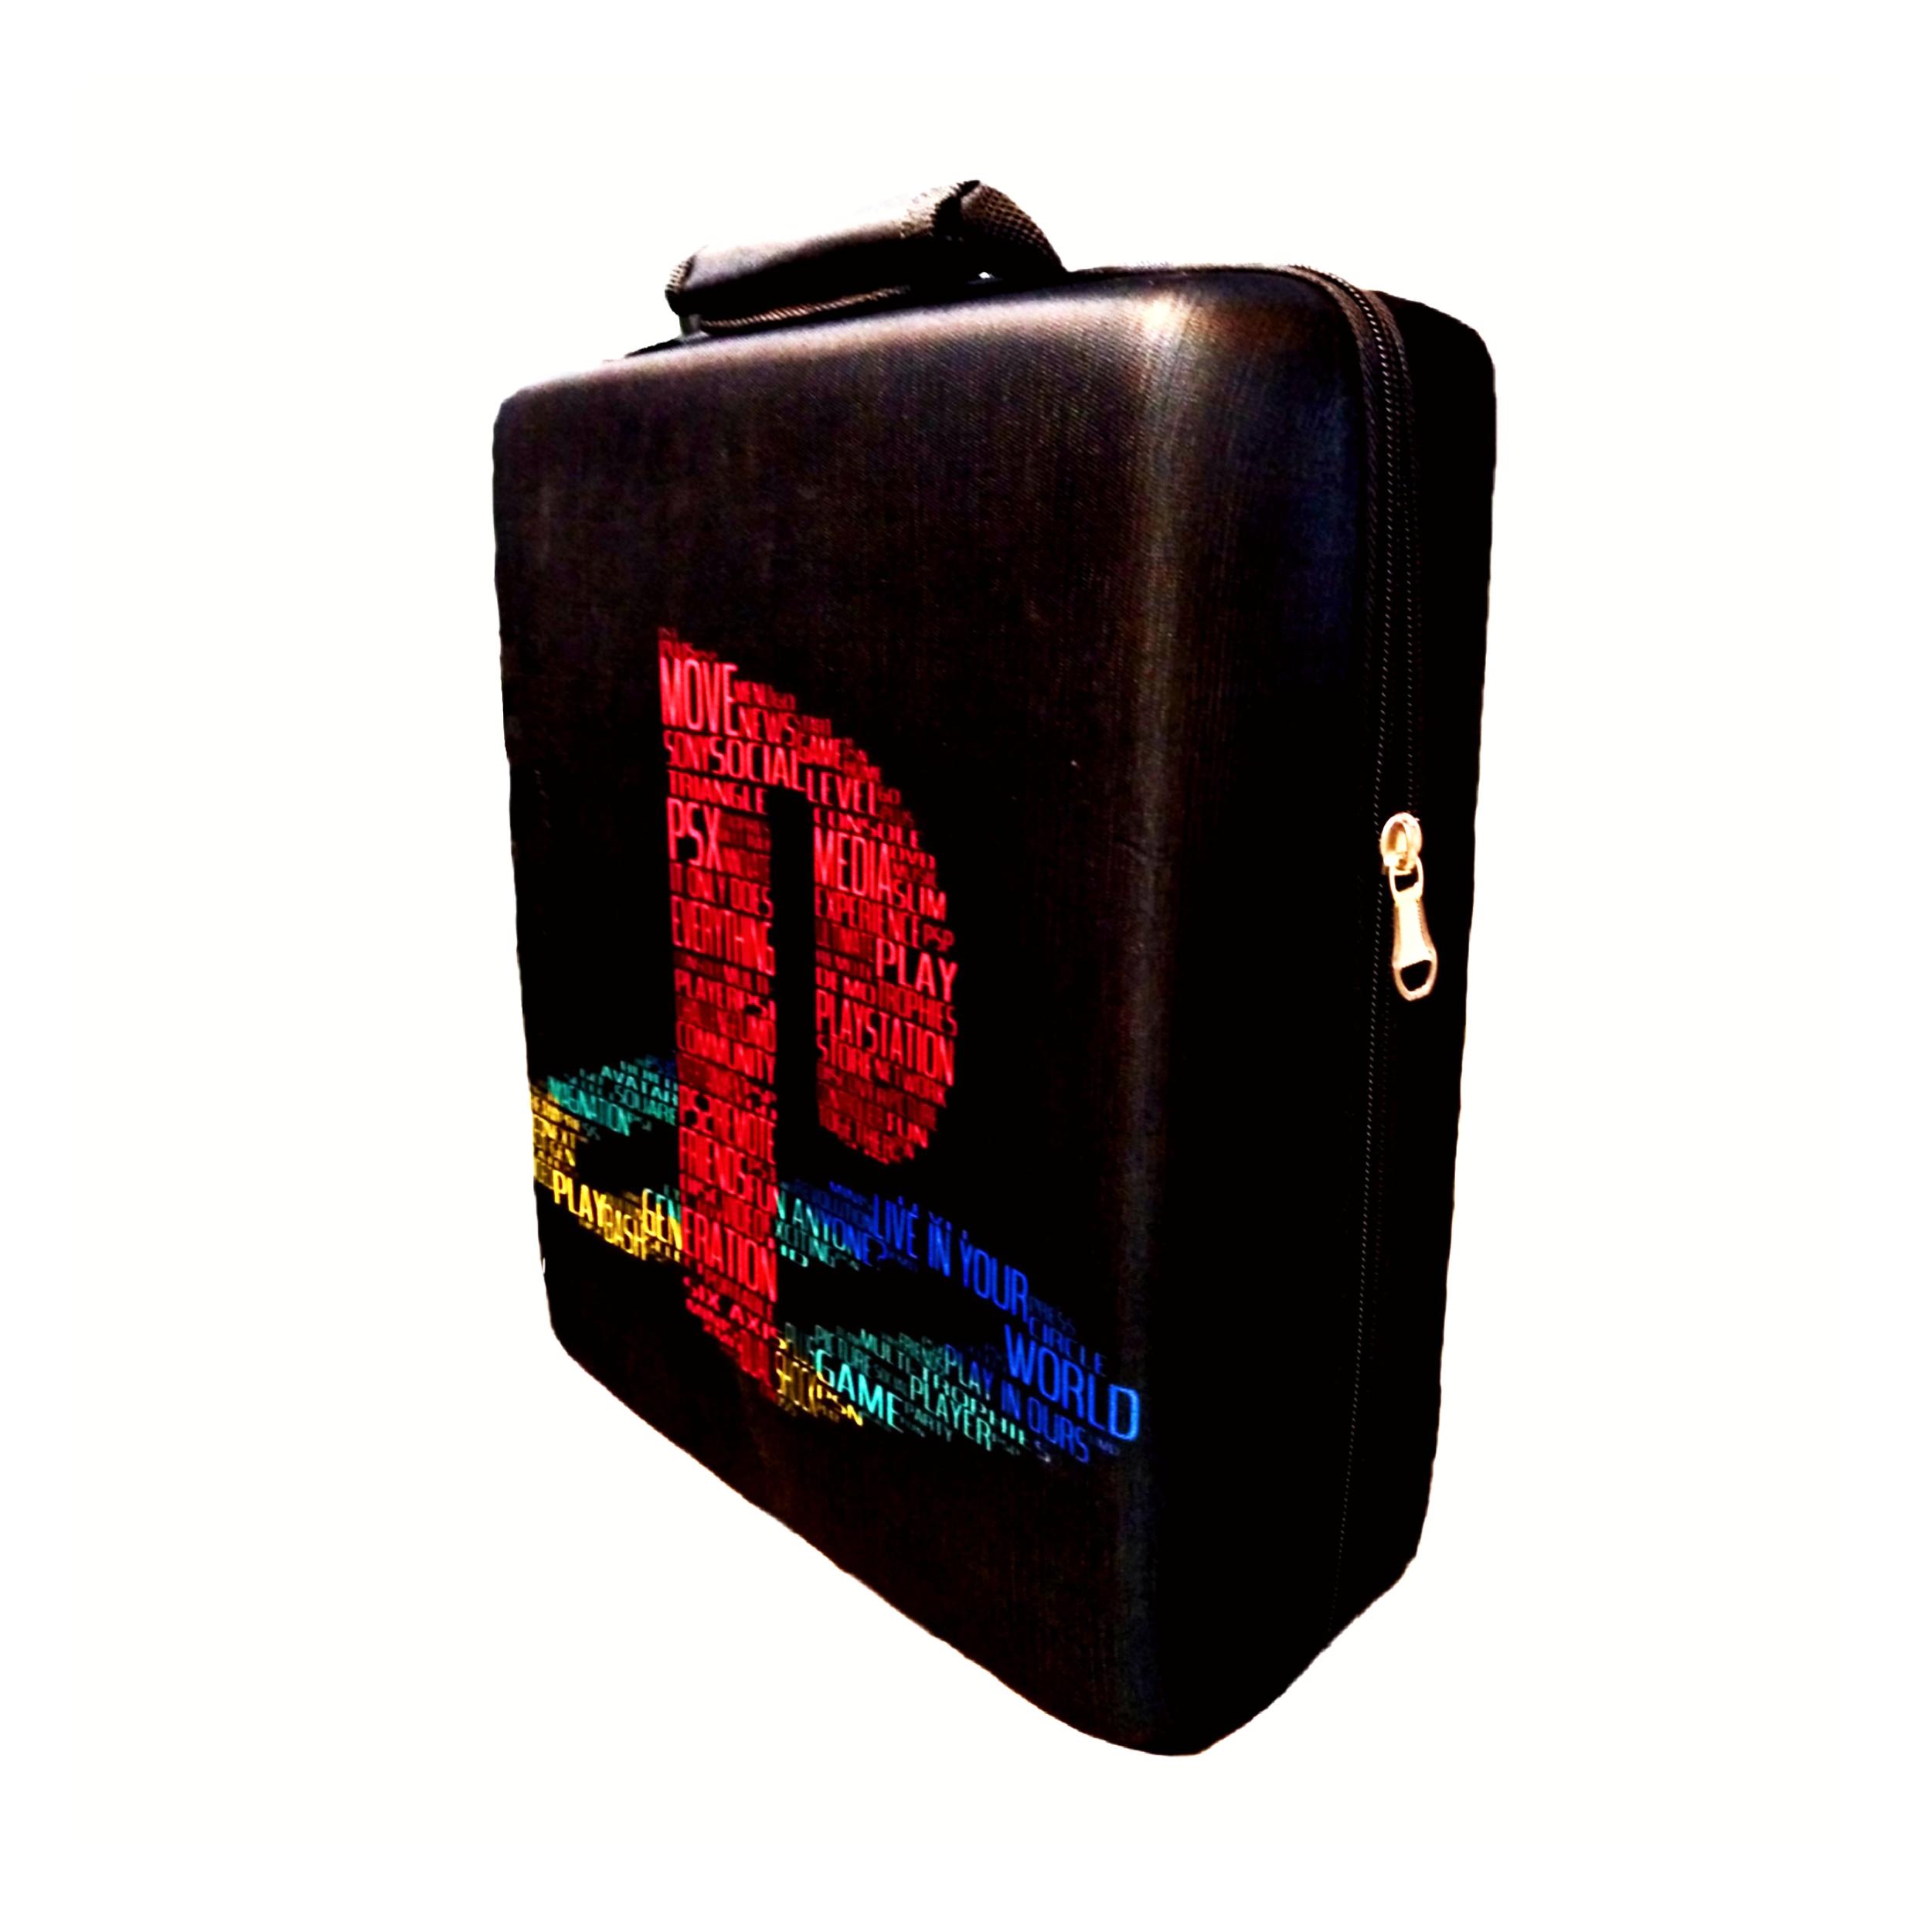 کیف حمل پلی استیشن 4 مدل Playstation کد 1025